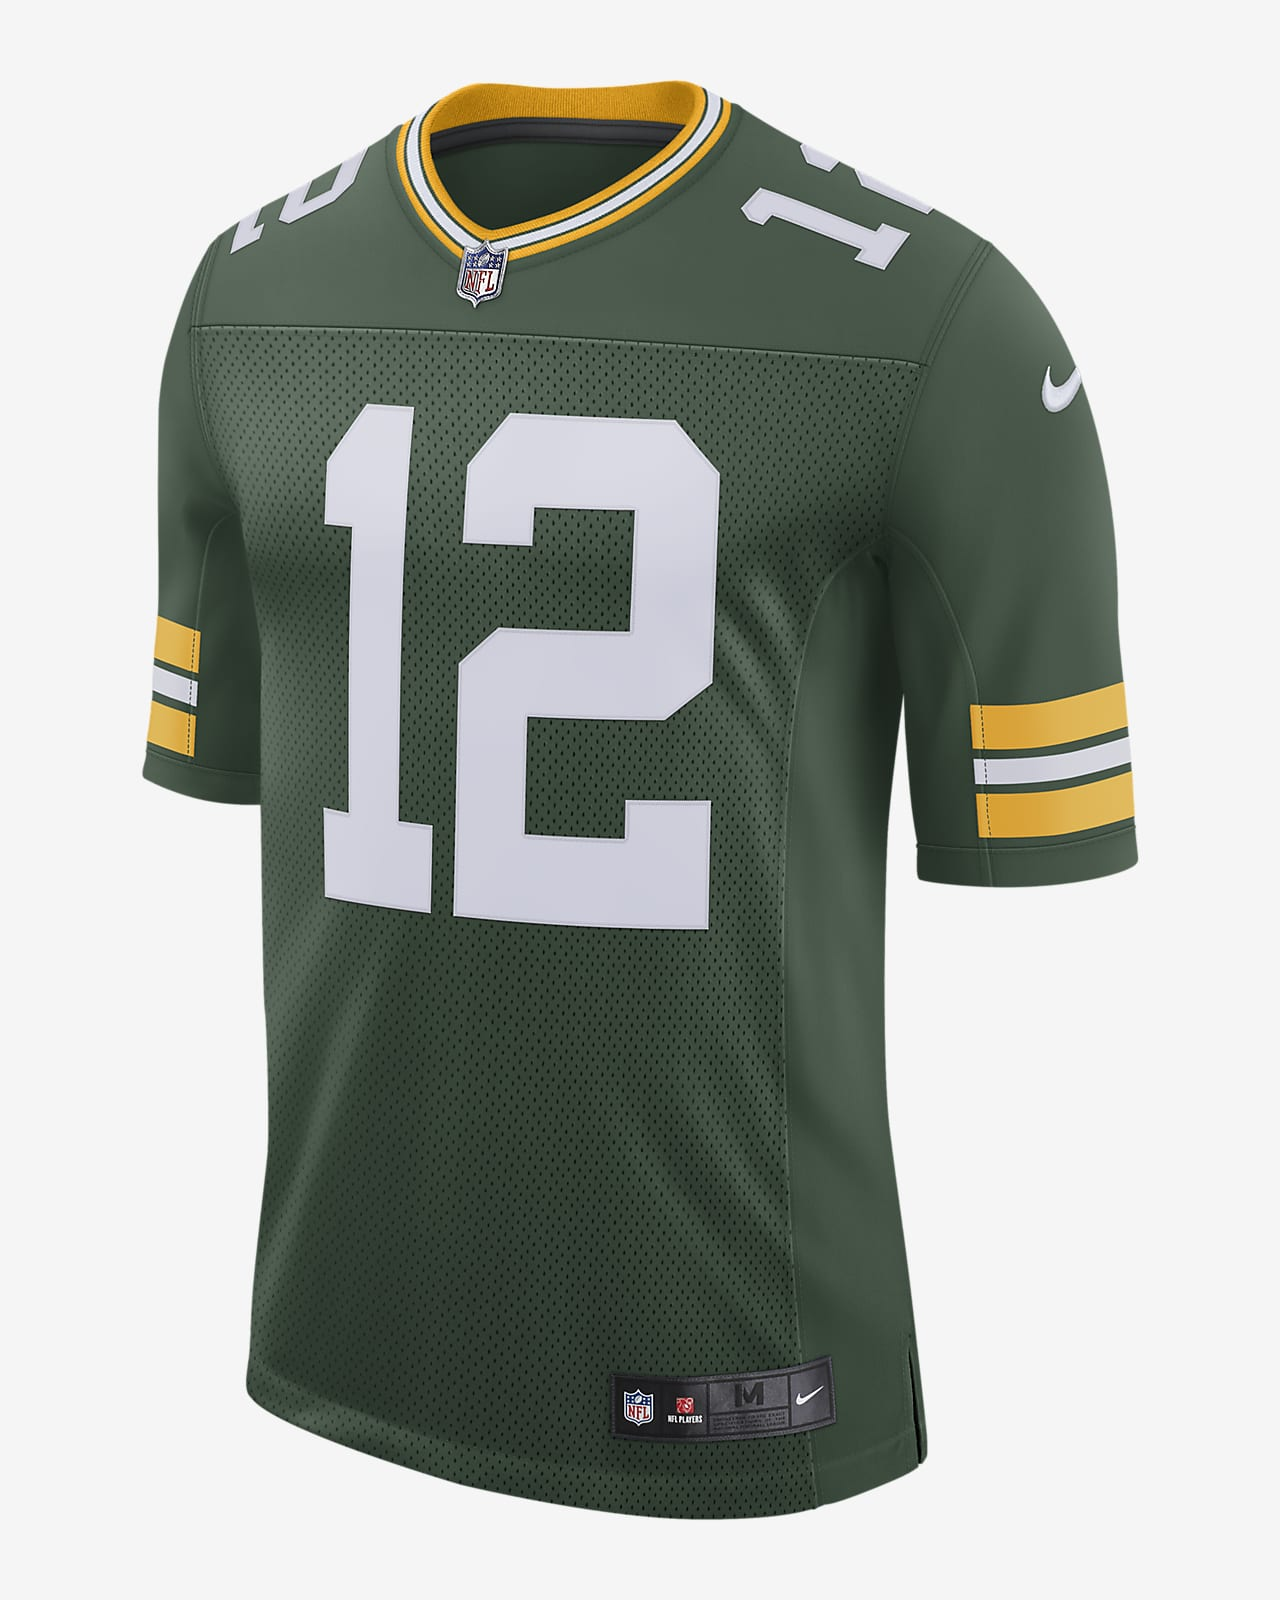 Maillot de football américain Limited NFL Green Bay Packers Vapor Untouchable (Aaron Rodgers) pour Homme